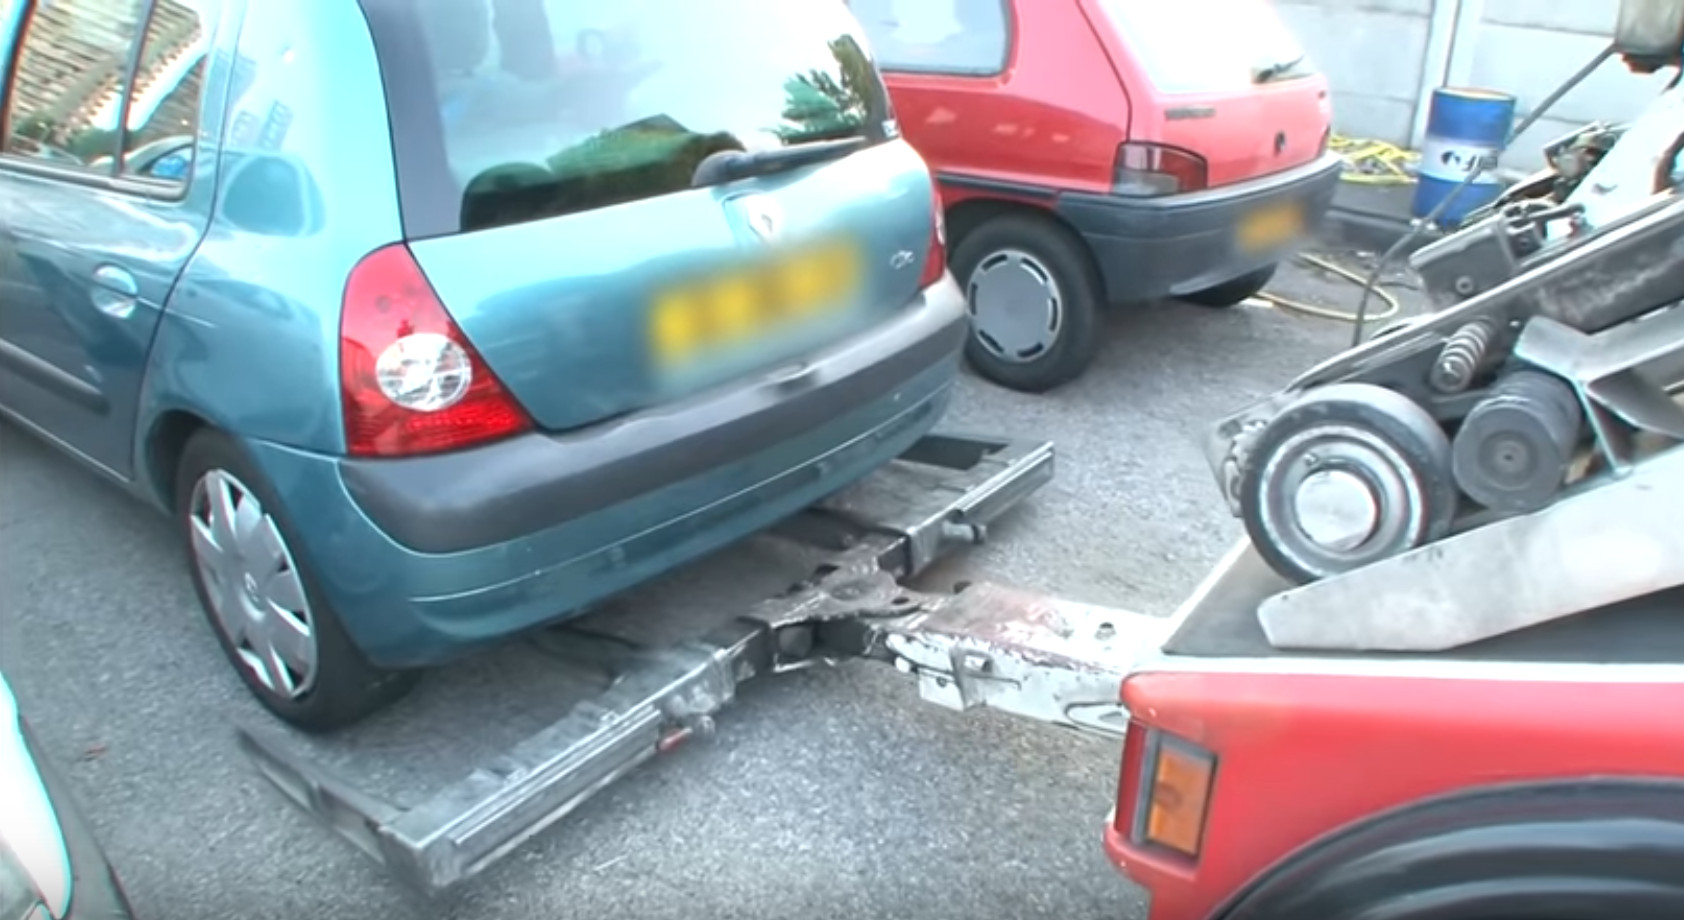 Enlèvement voiture à Lingolsheim